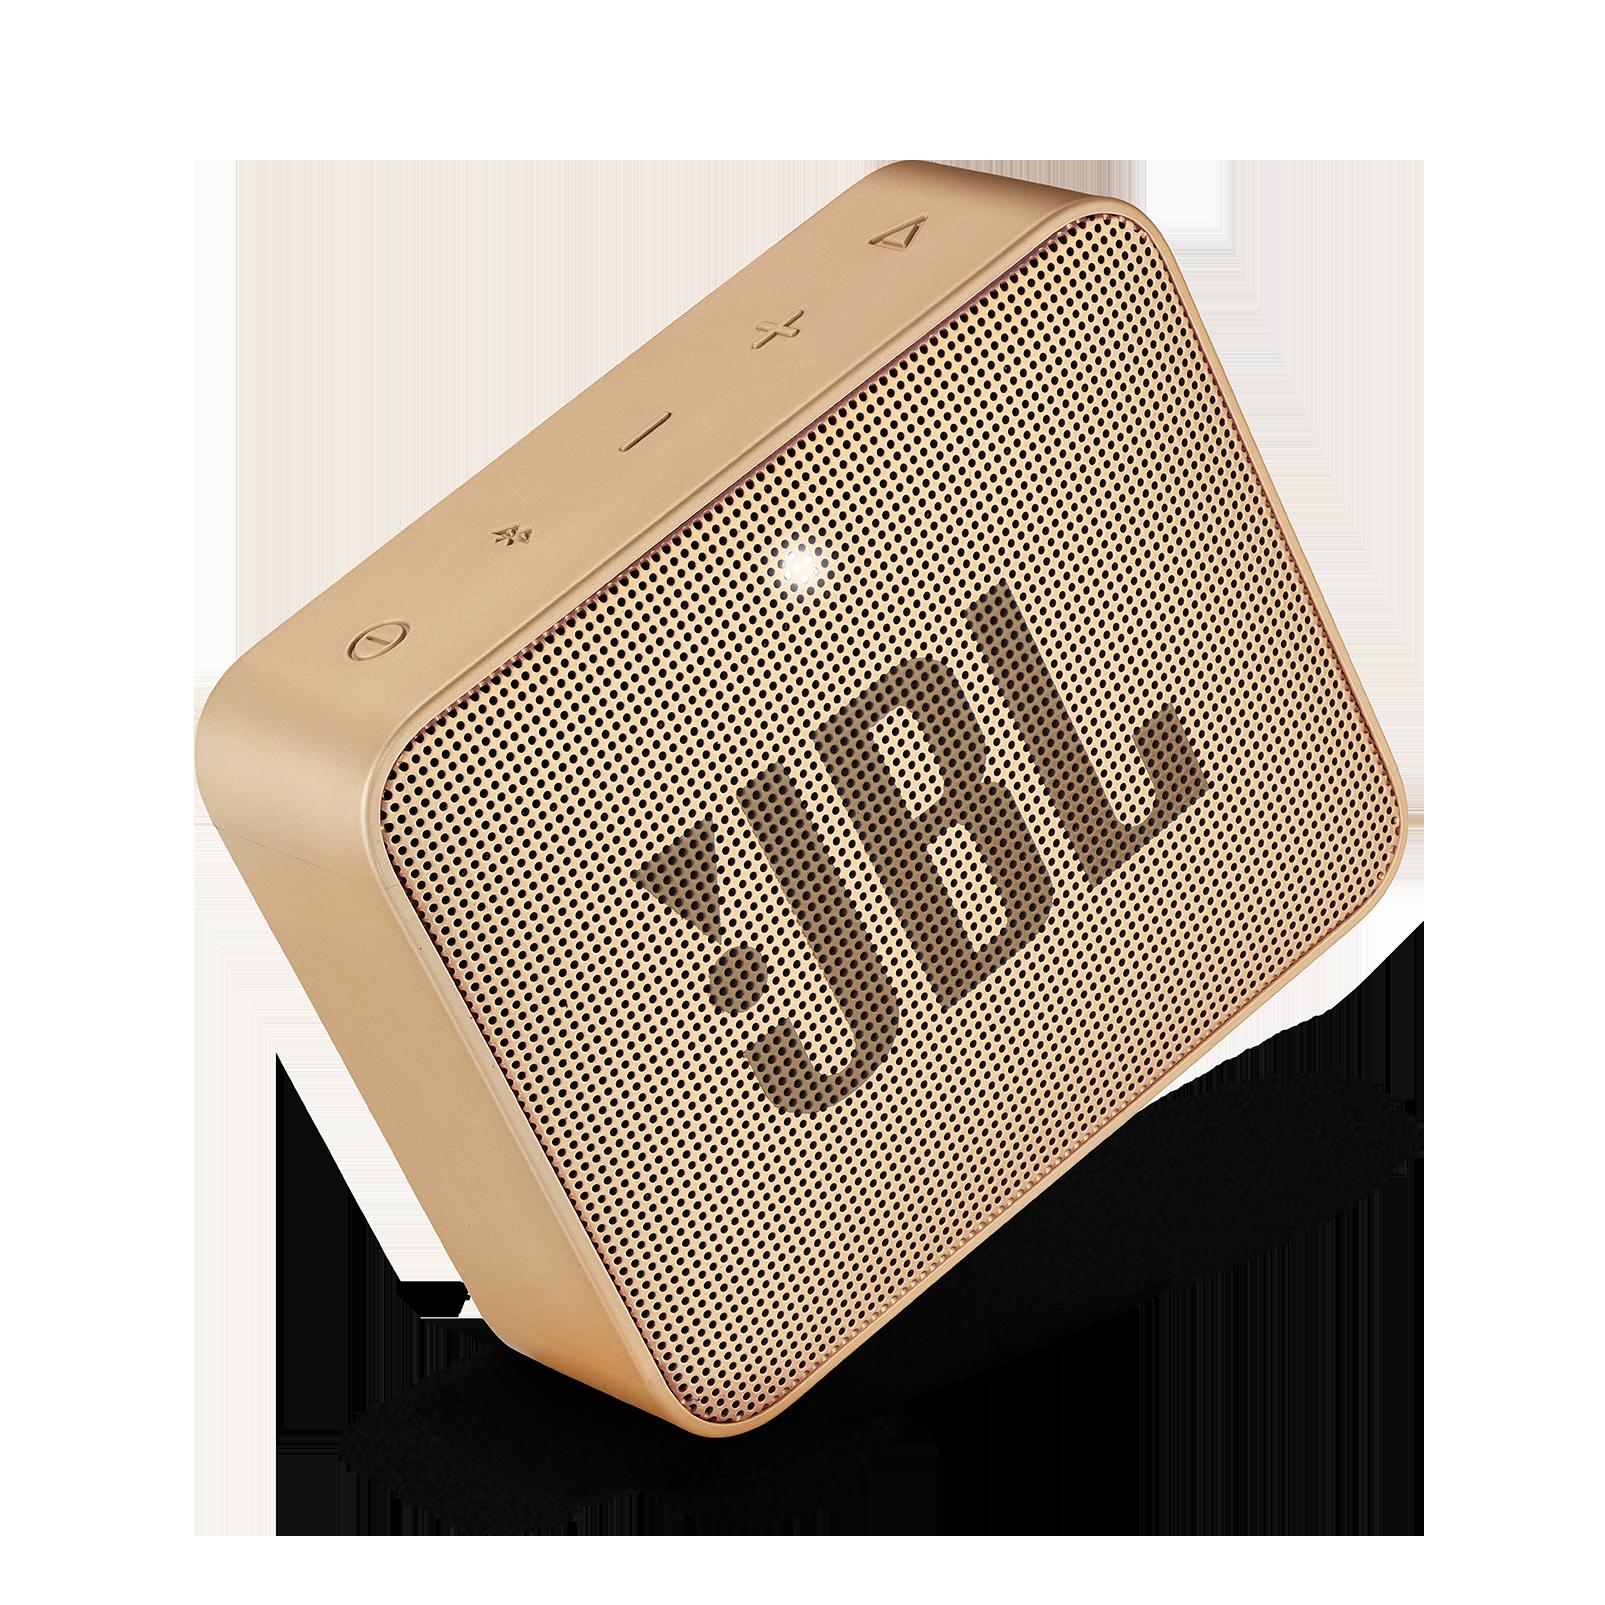 JBL GO 2 - Pearl Champagne - Portable Bluetooth speaker - Detailshot 1